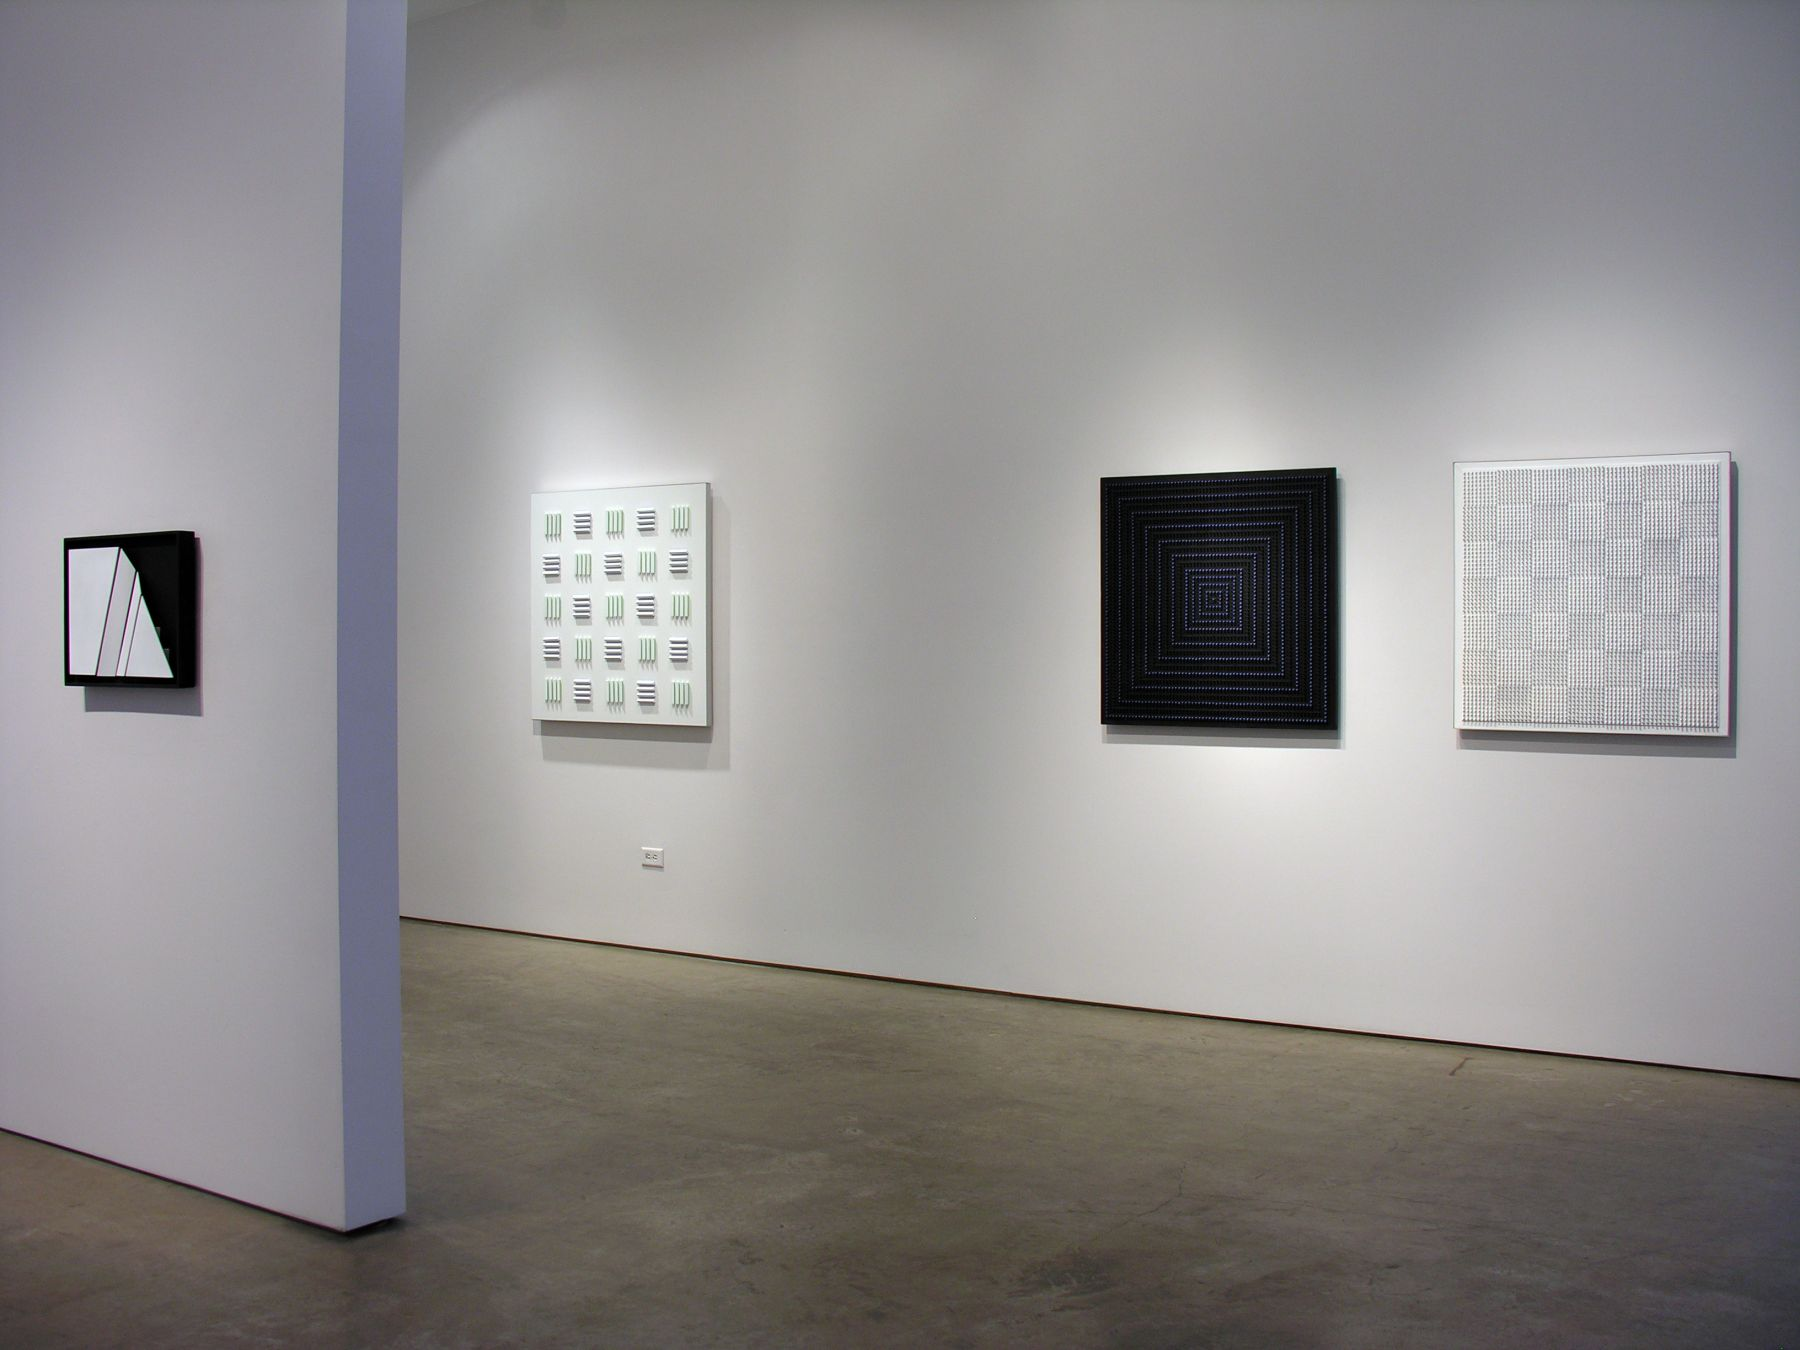 Luis Tomasello, Exhibition at Sicardi | Ayers | Bacino, 2009